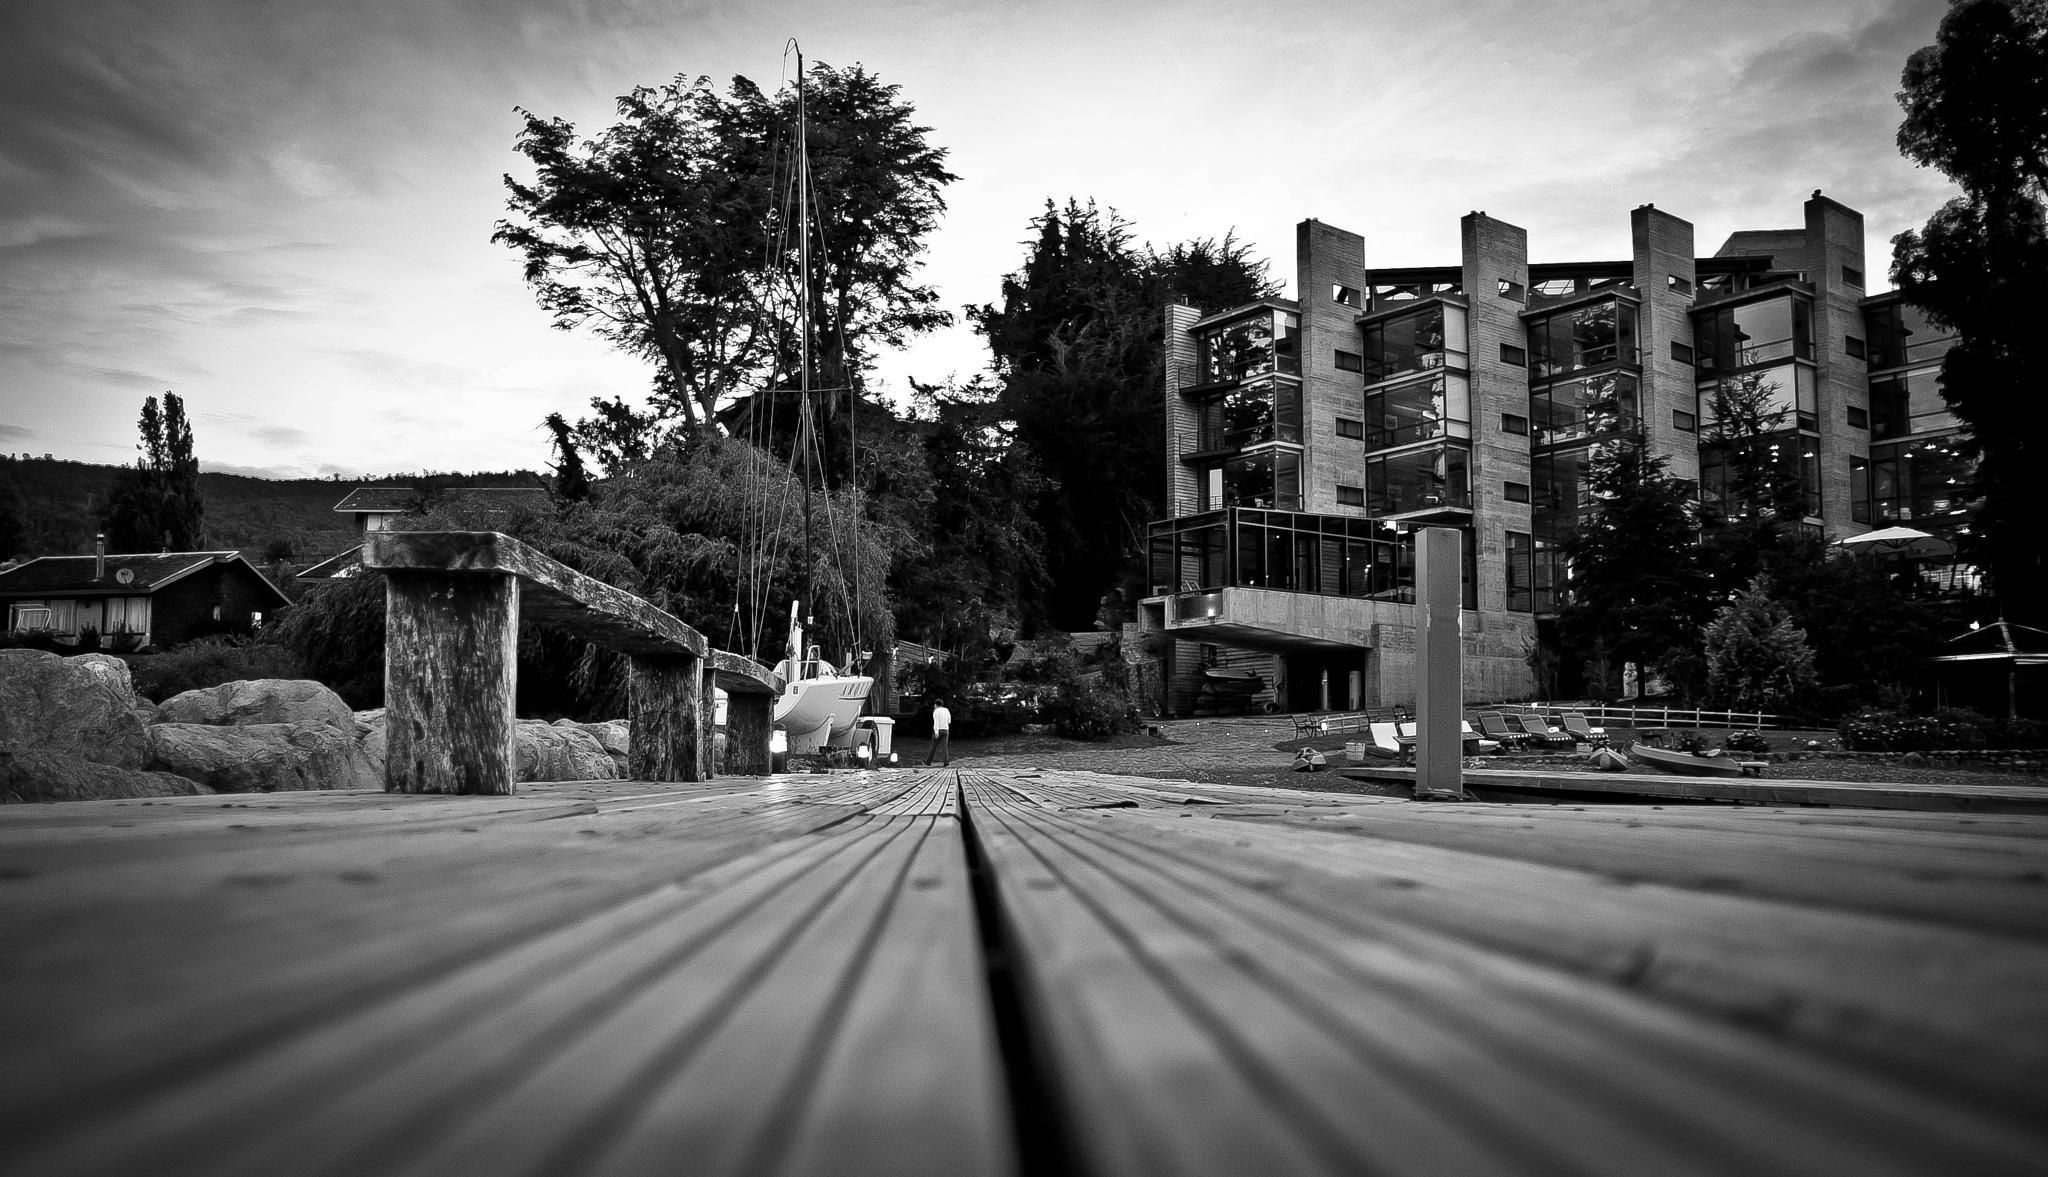 Pespectiva  by oscarruben_suarez